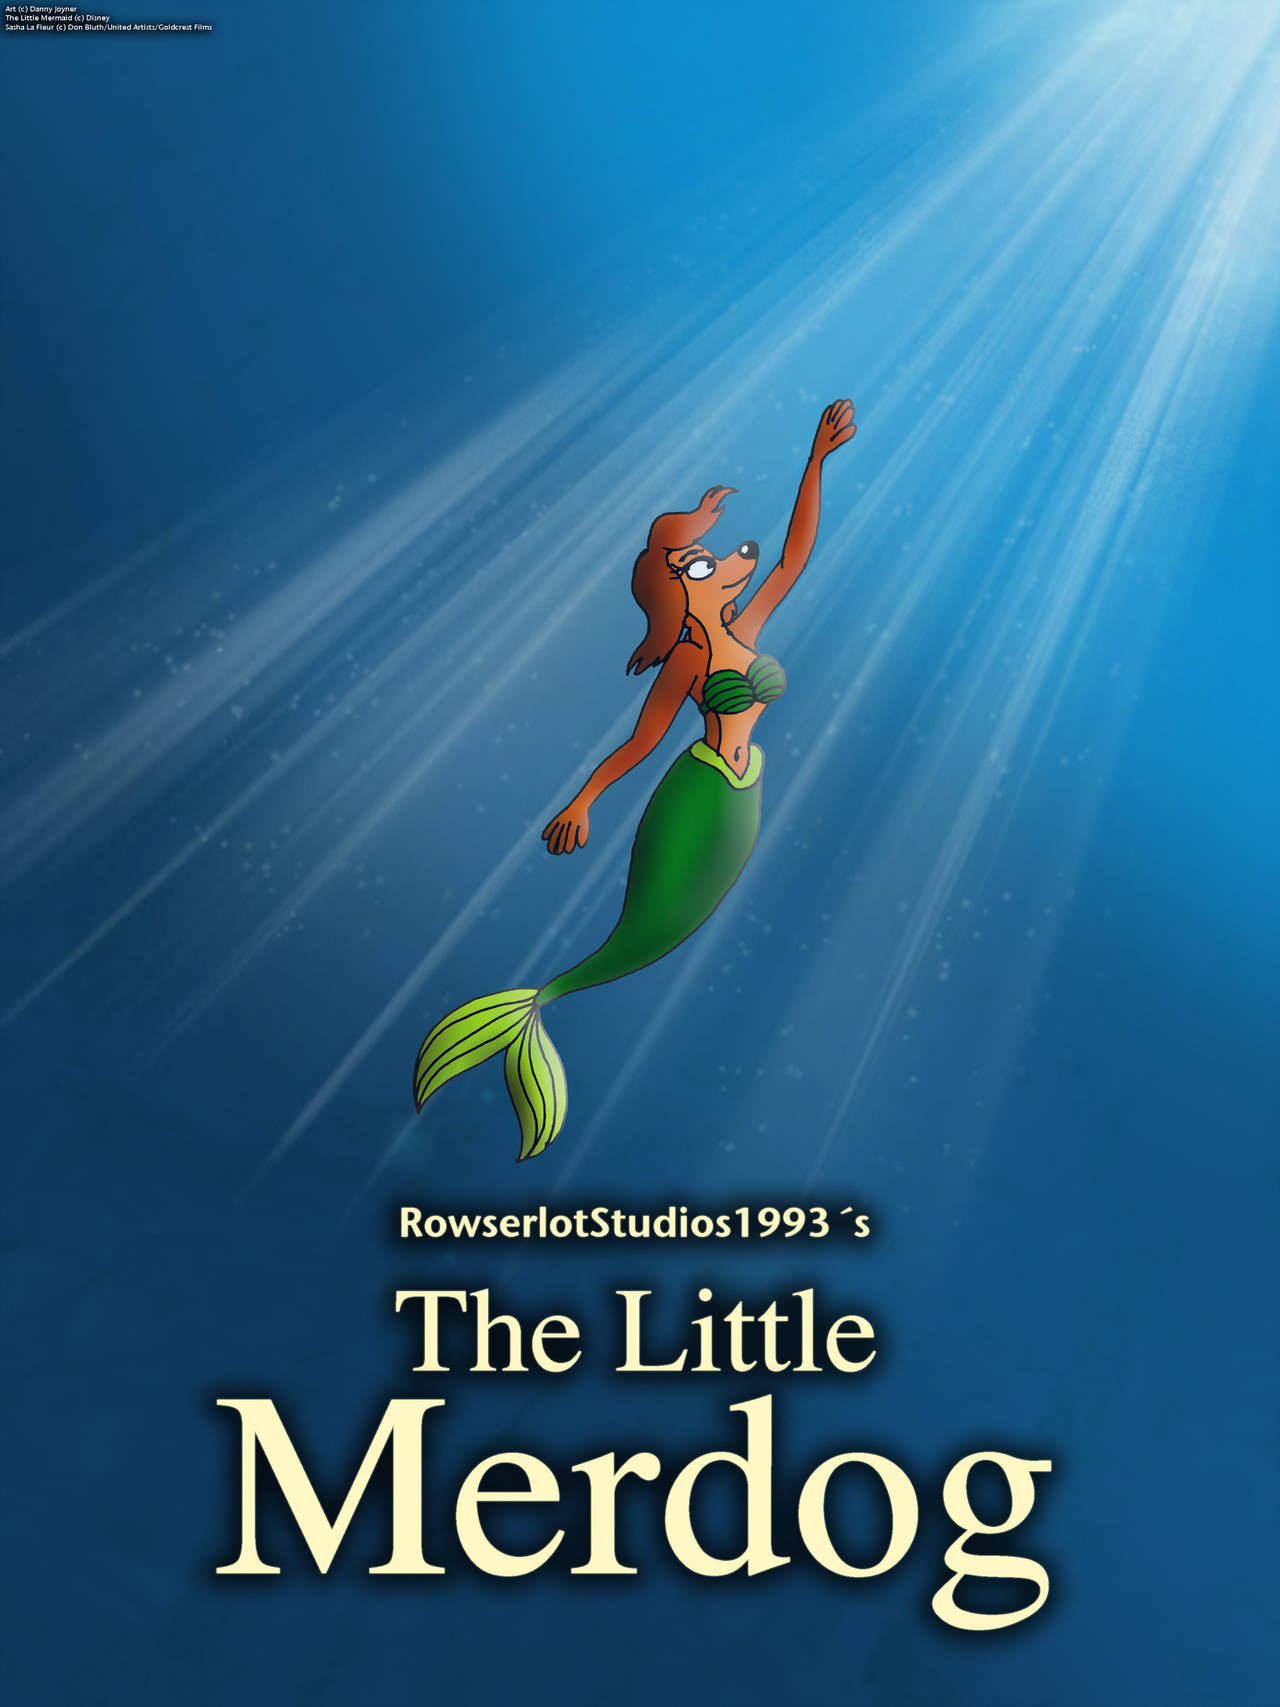 The Little Merdog (Sasha version)